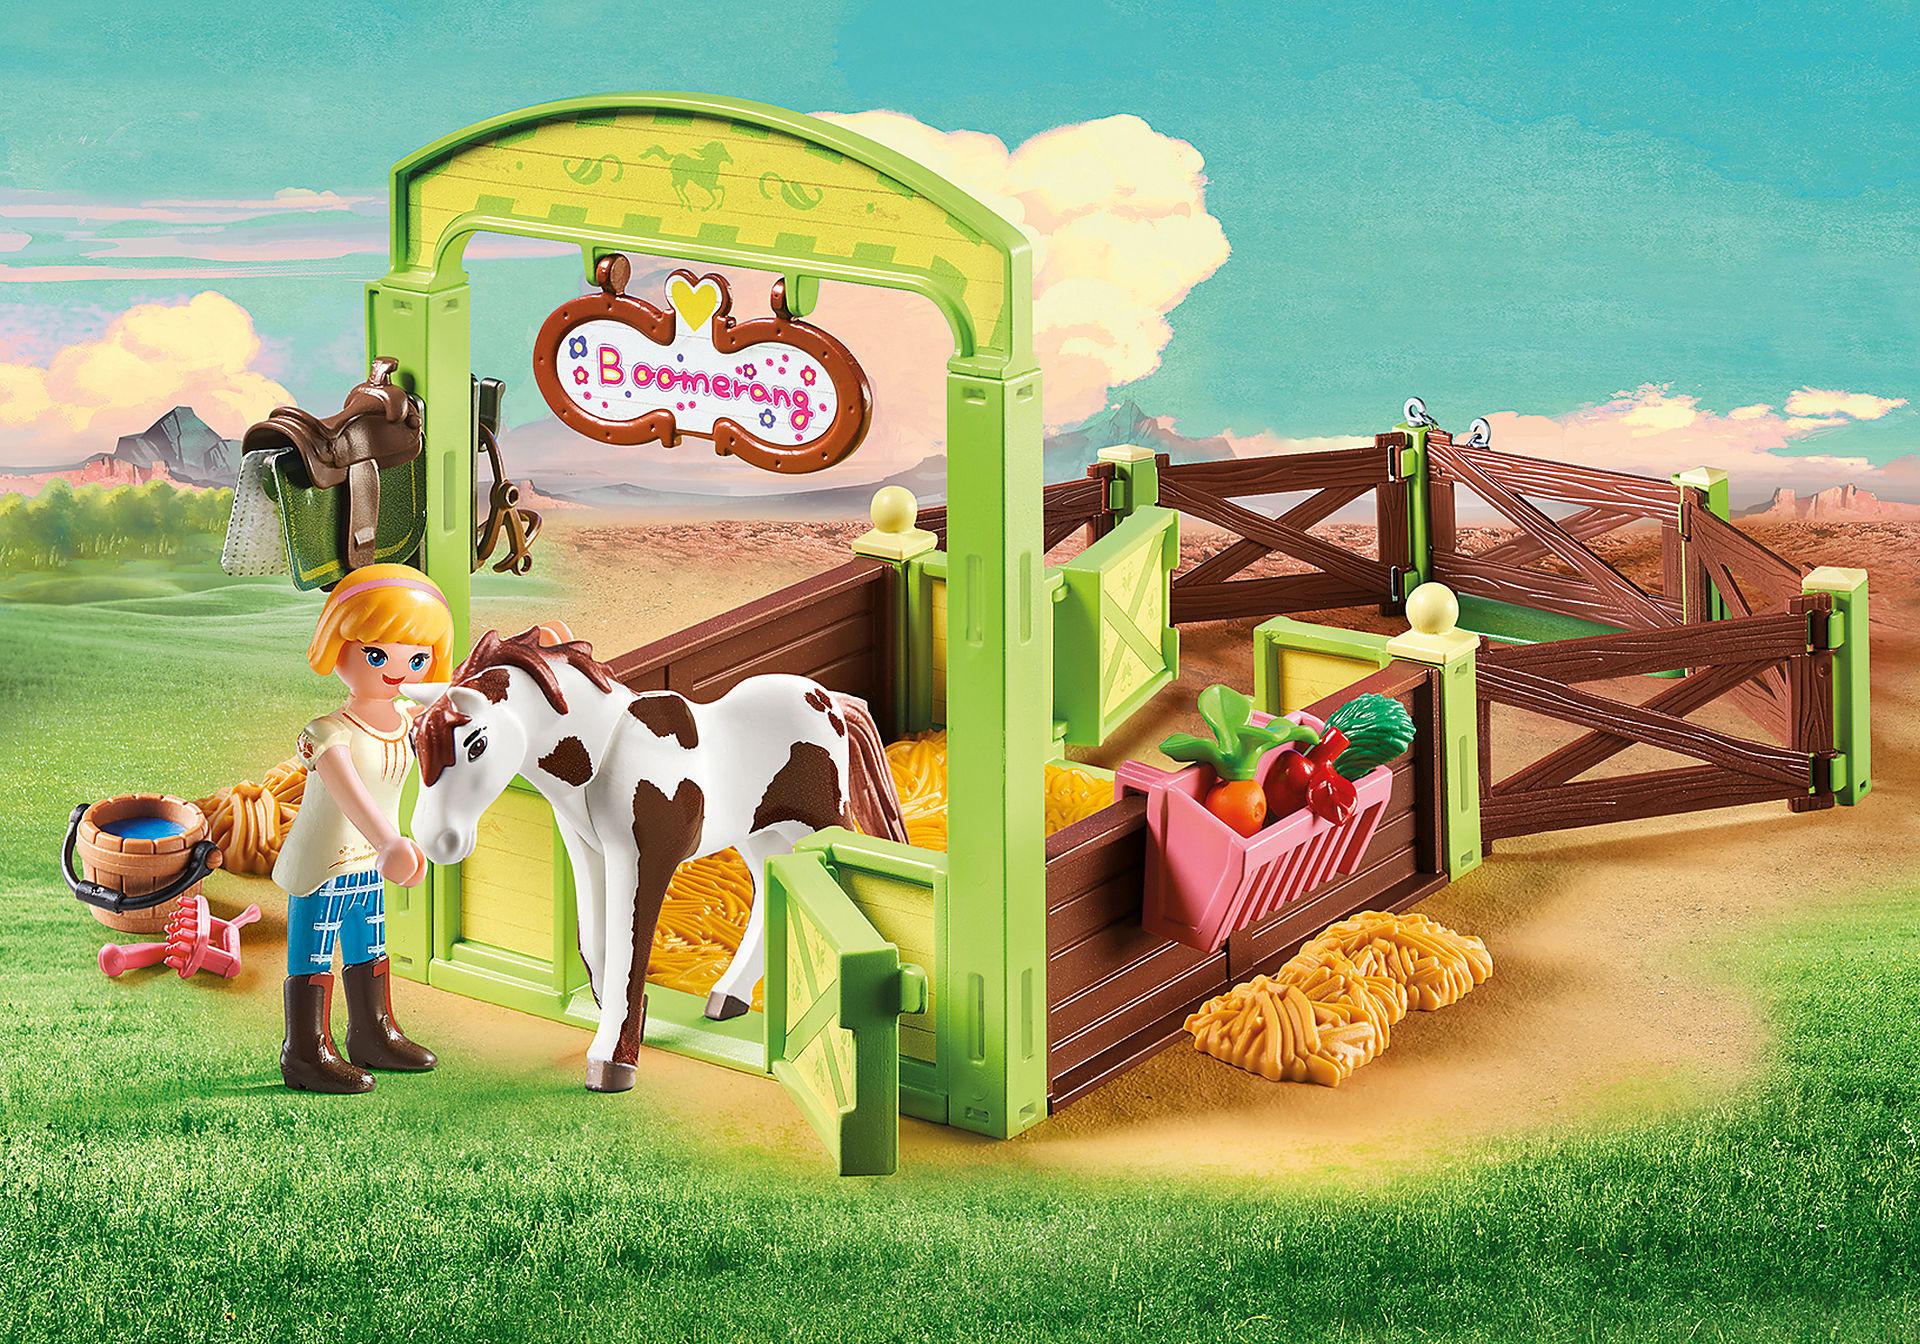 http://media.playmobil.com/i/playmobil/9480_product_detail/Η Άμπιγκεϊλ με το άλογο Μπούμερανγκ